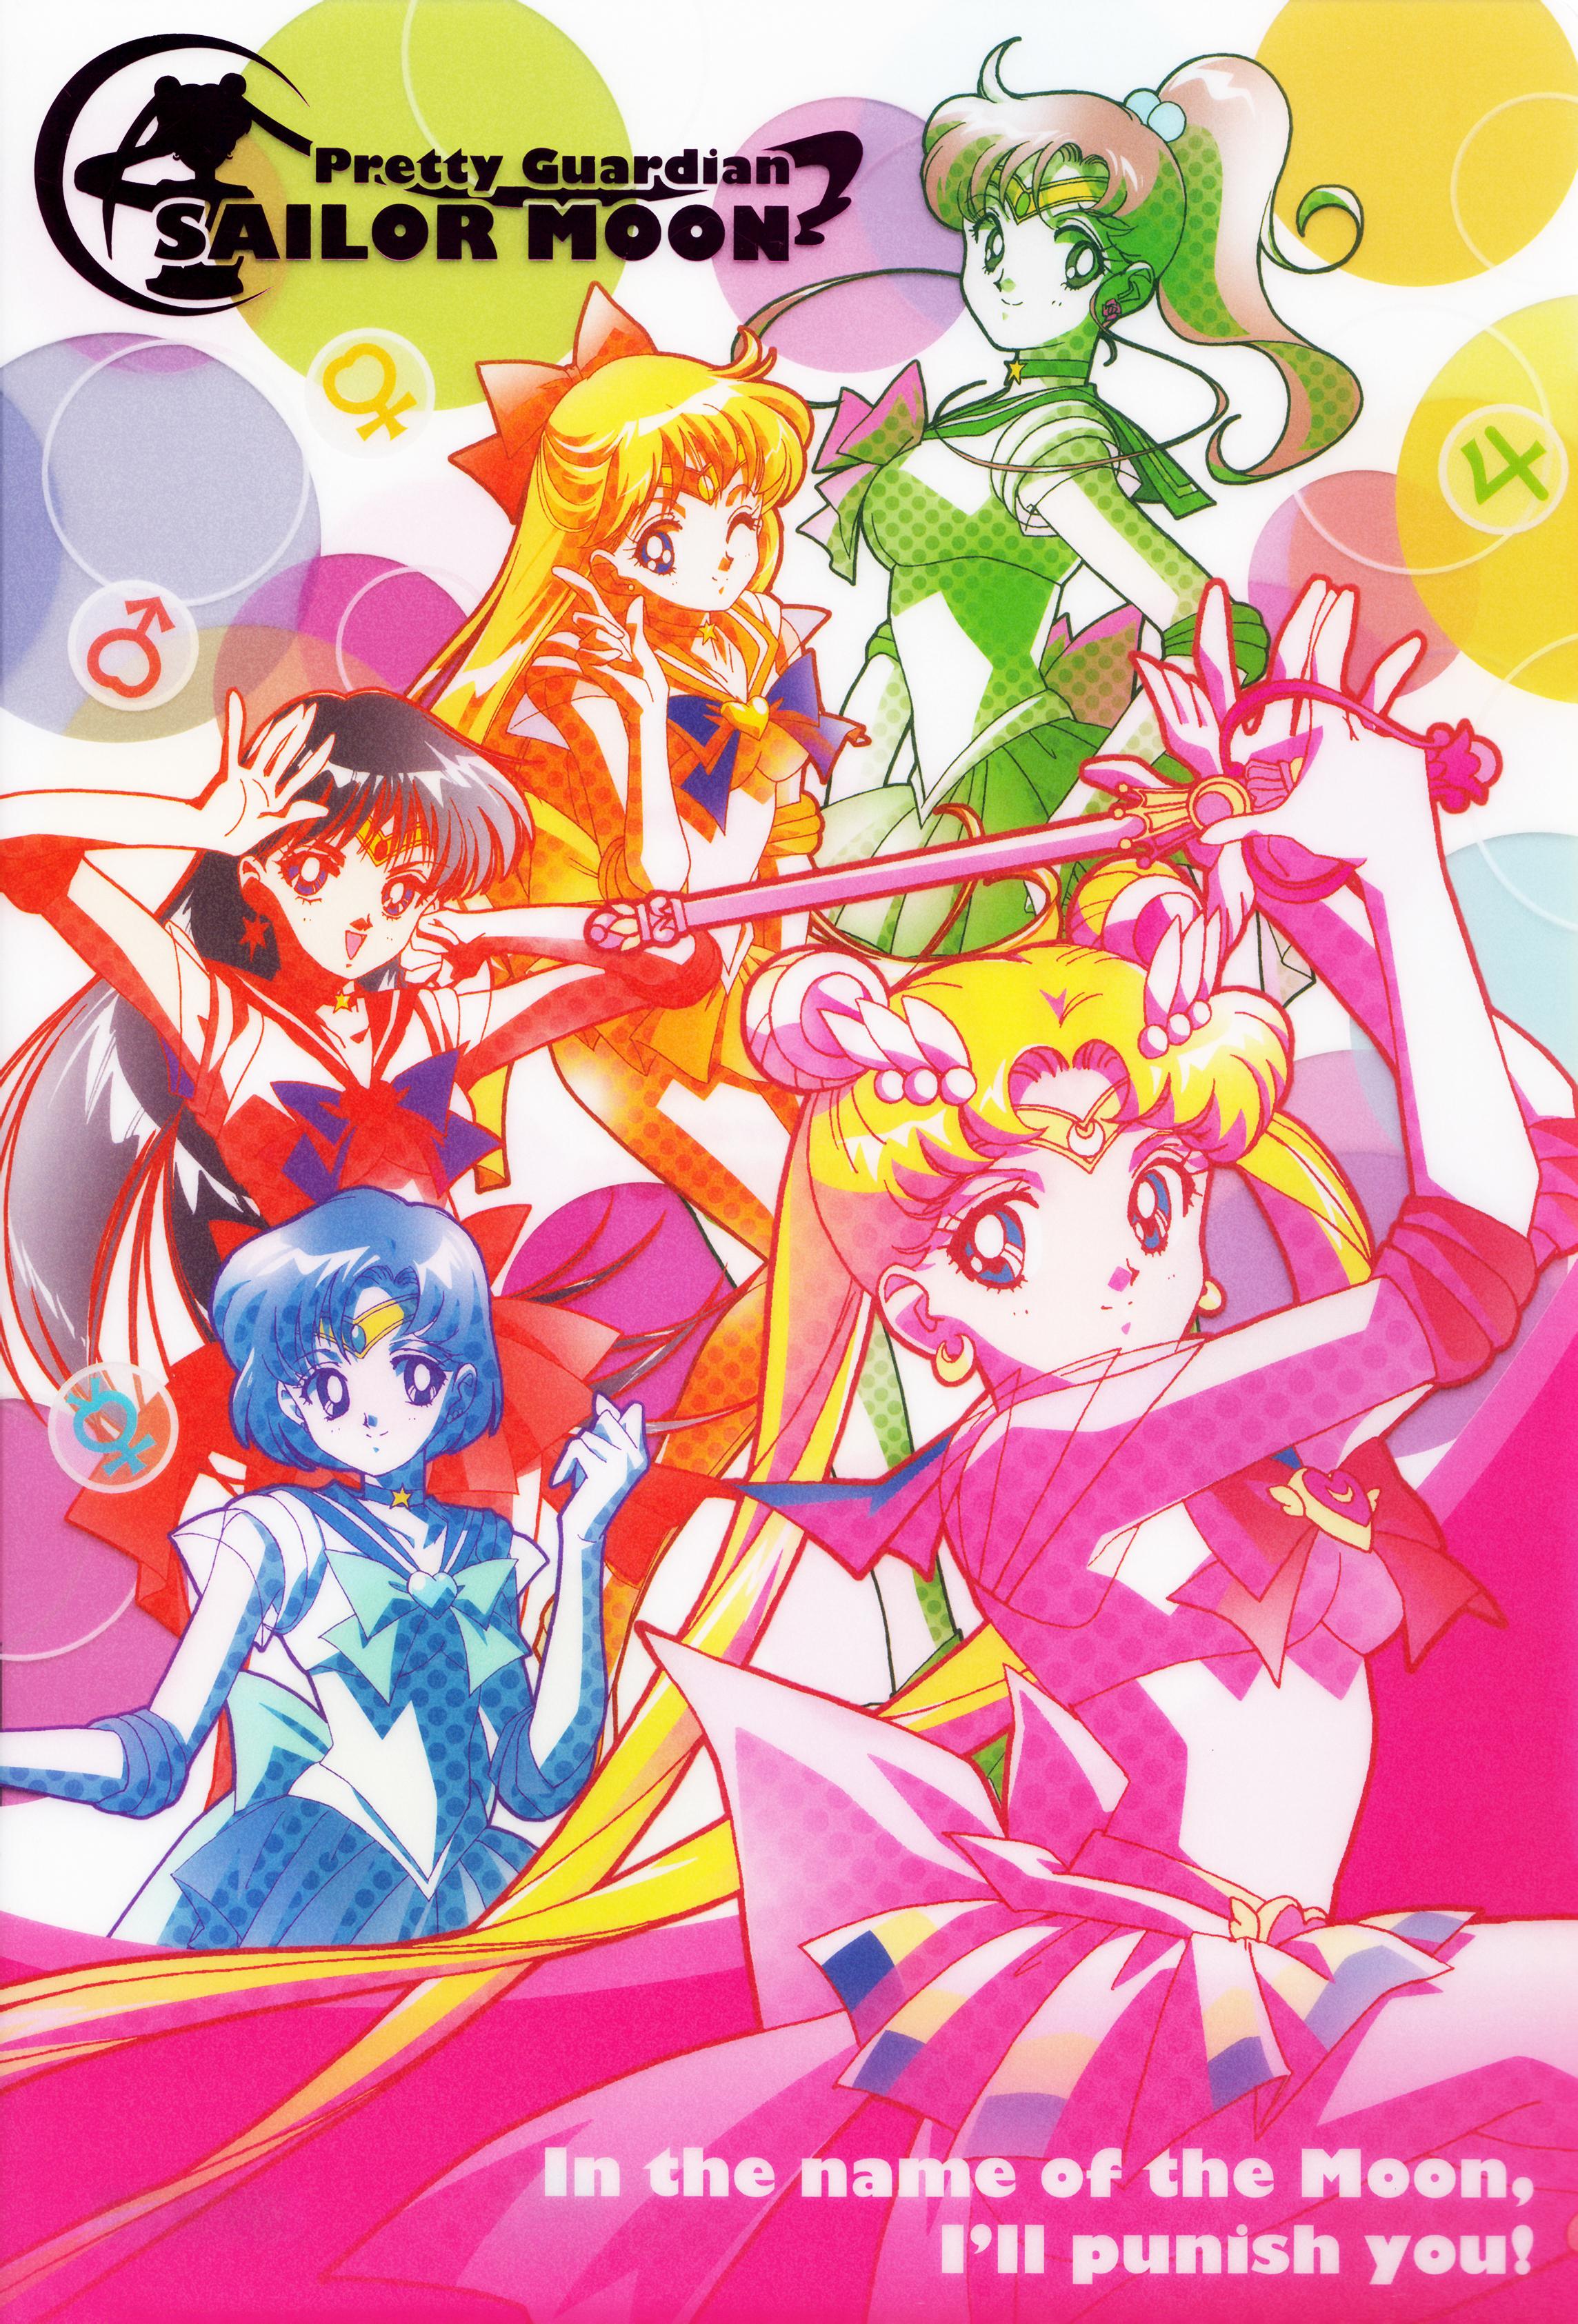 Sailor_moon_new_stationary_05